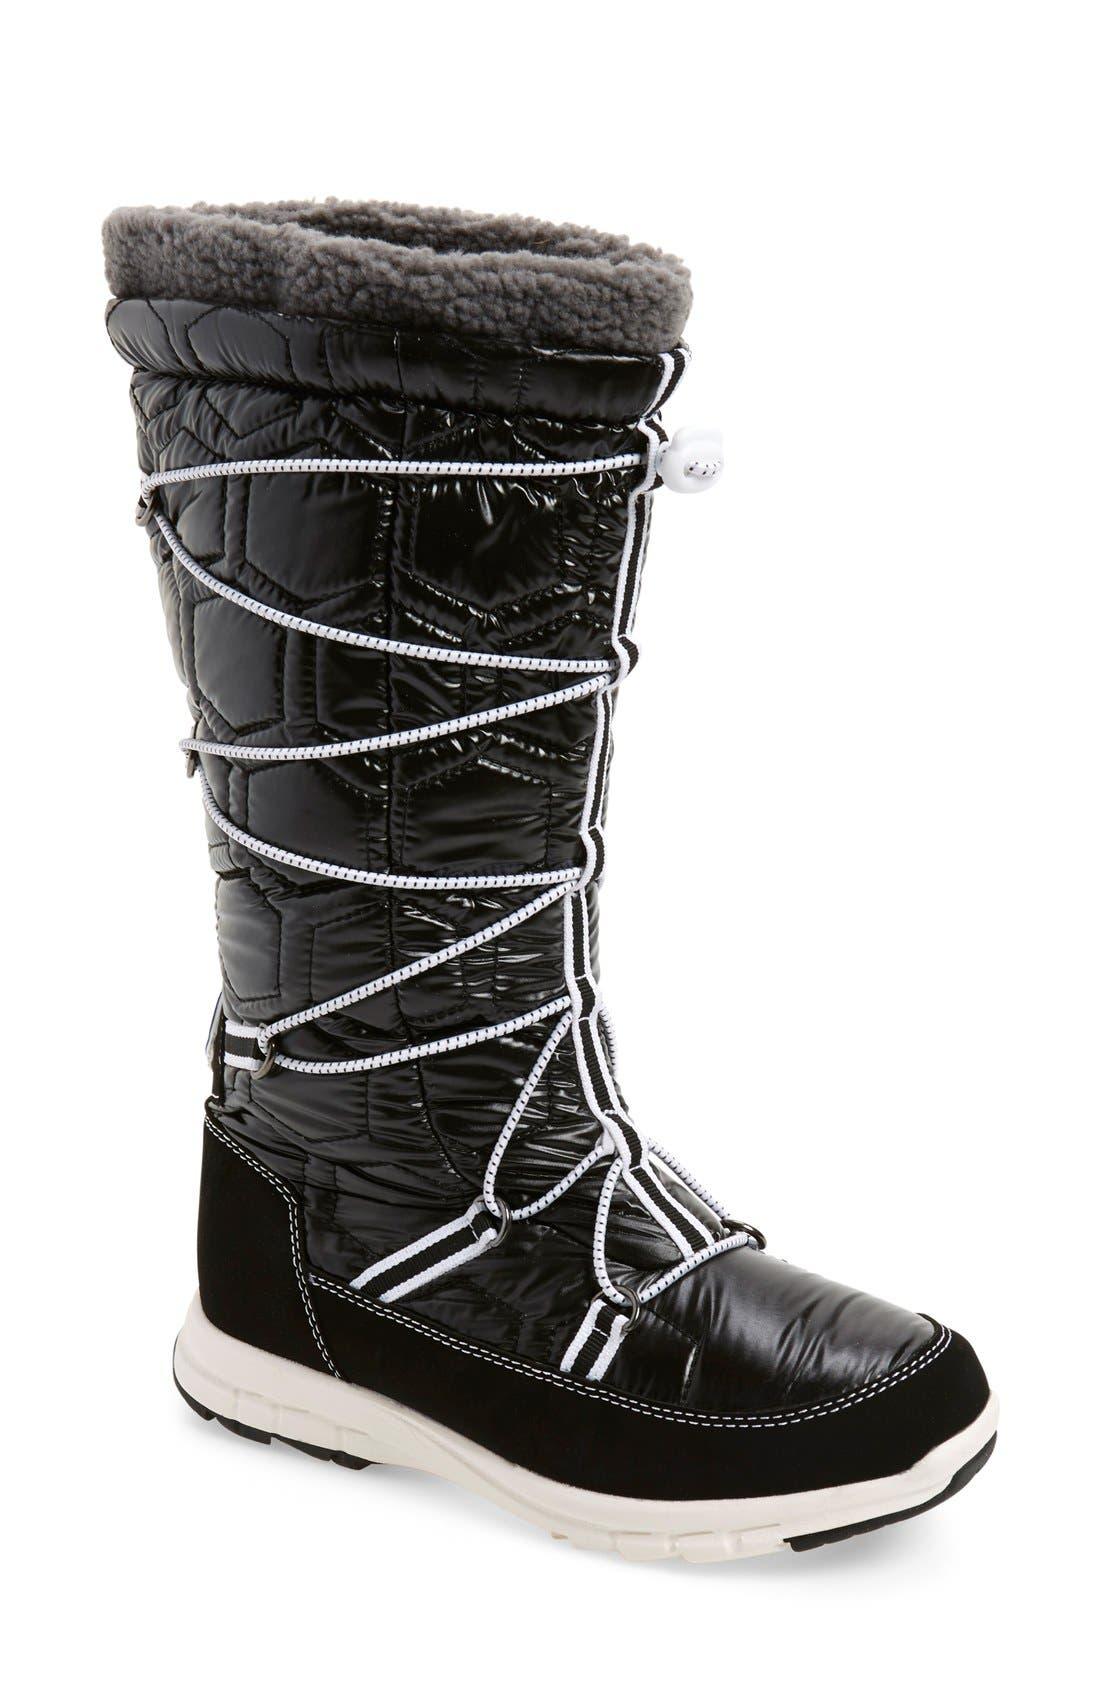 Alternate Image 1 Selected - Khombu 'Slalom' Tall Waterproof Boot (Women)